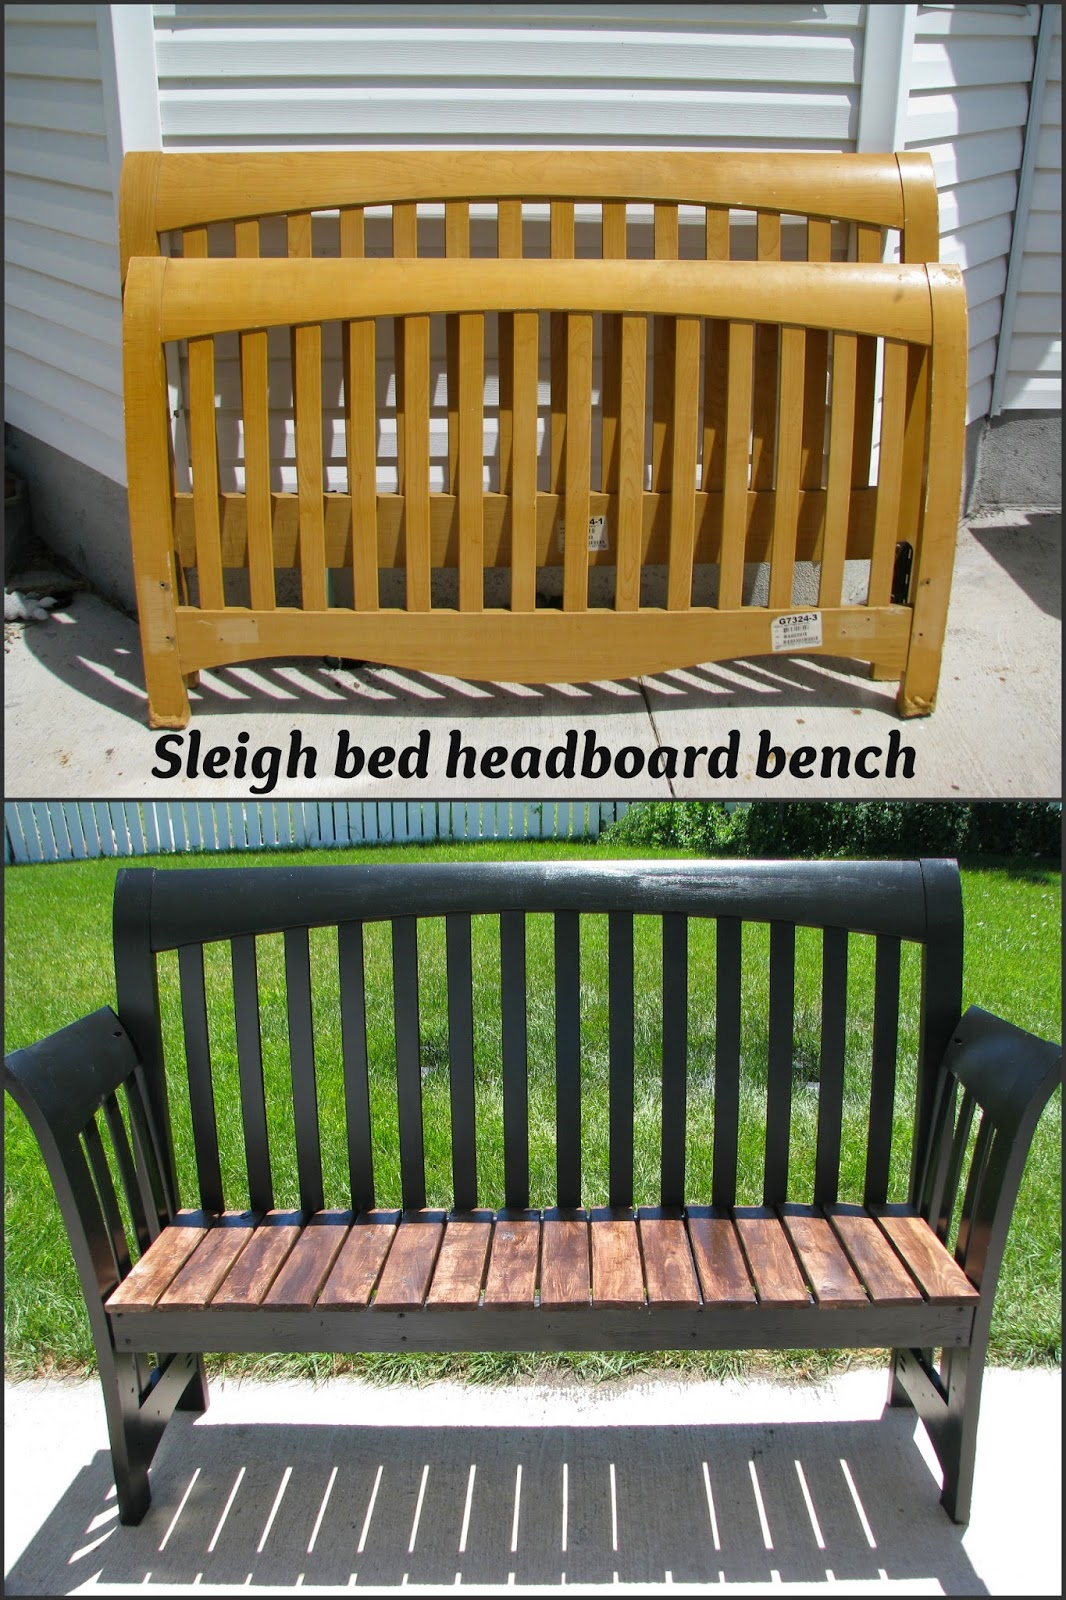 http://www.mysocalleddiyblog.com/2014/07/sleigh-bed-headboard-bench.html